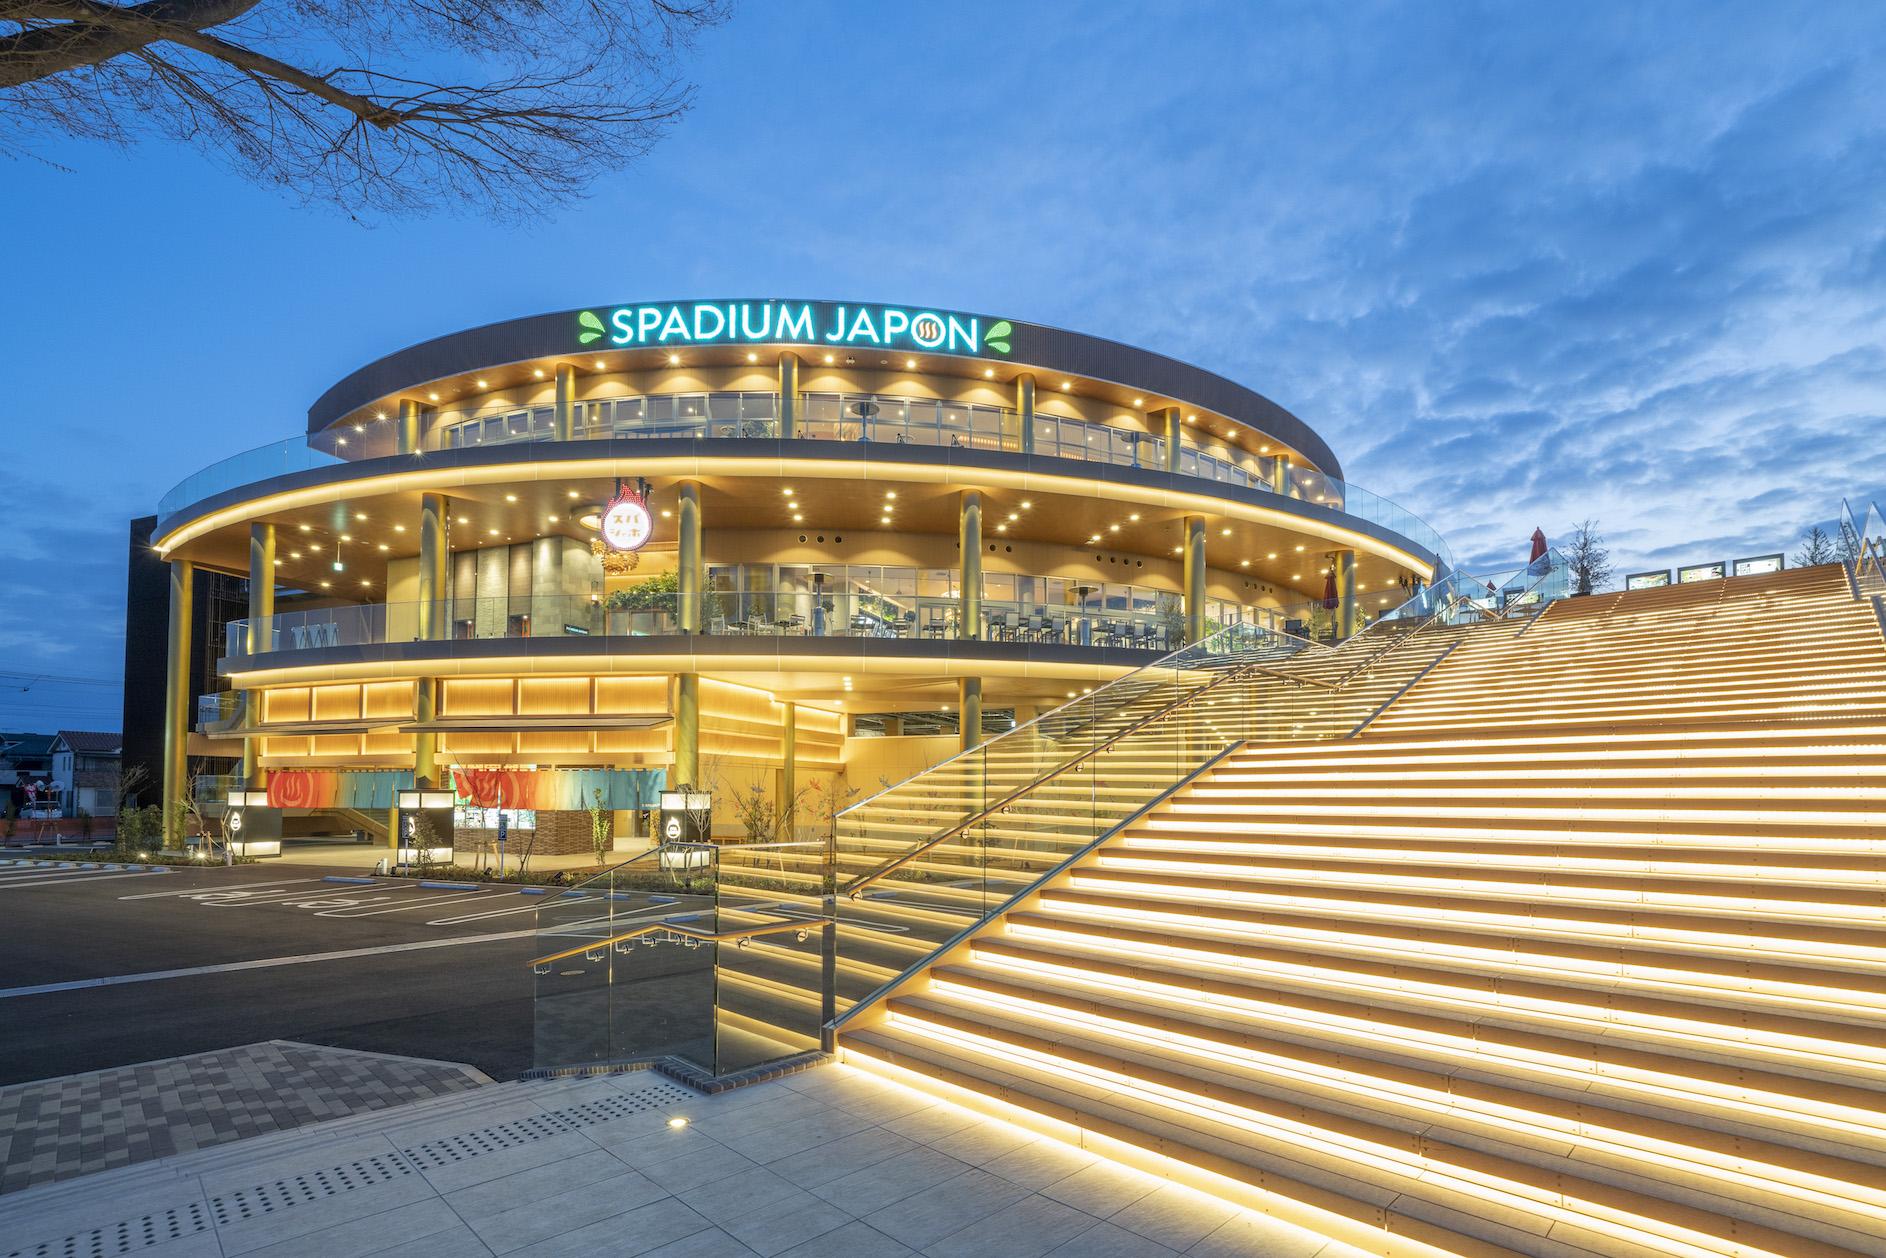 SPADIUM JAPON